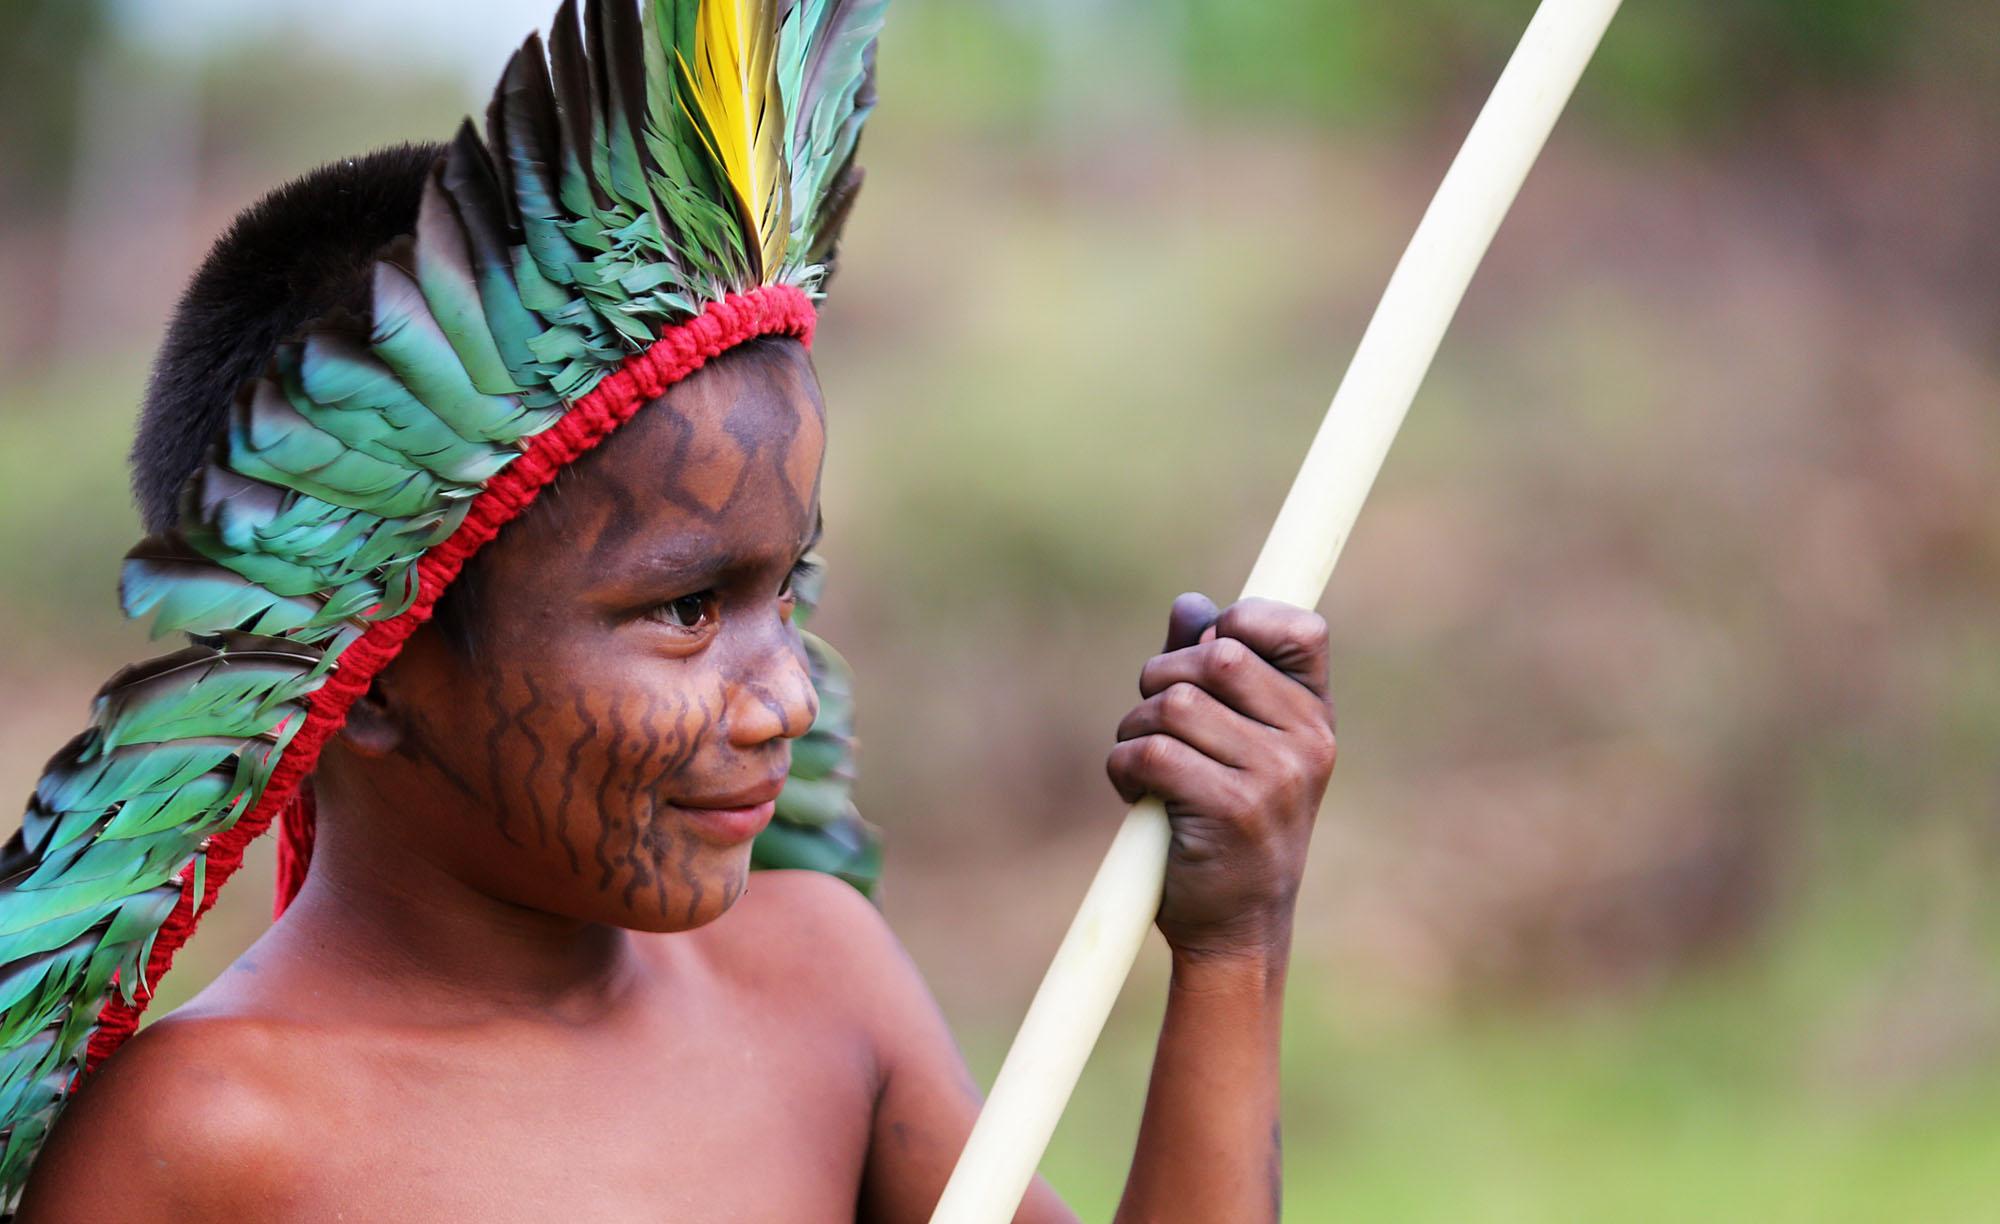 Olimpíada de Matemática homenageia povos indígenas